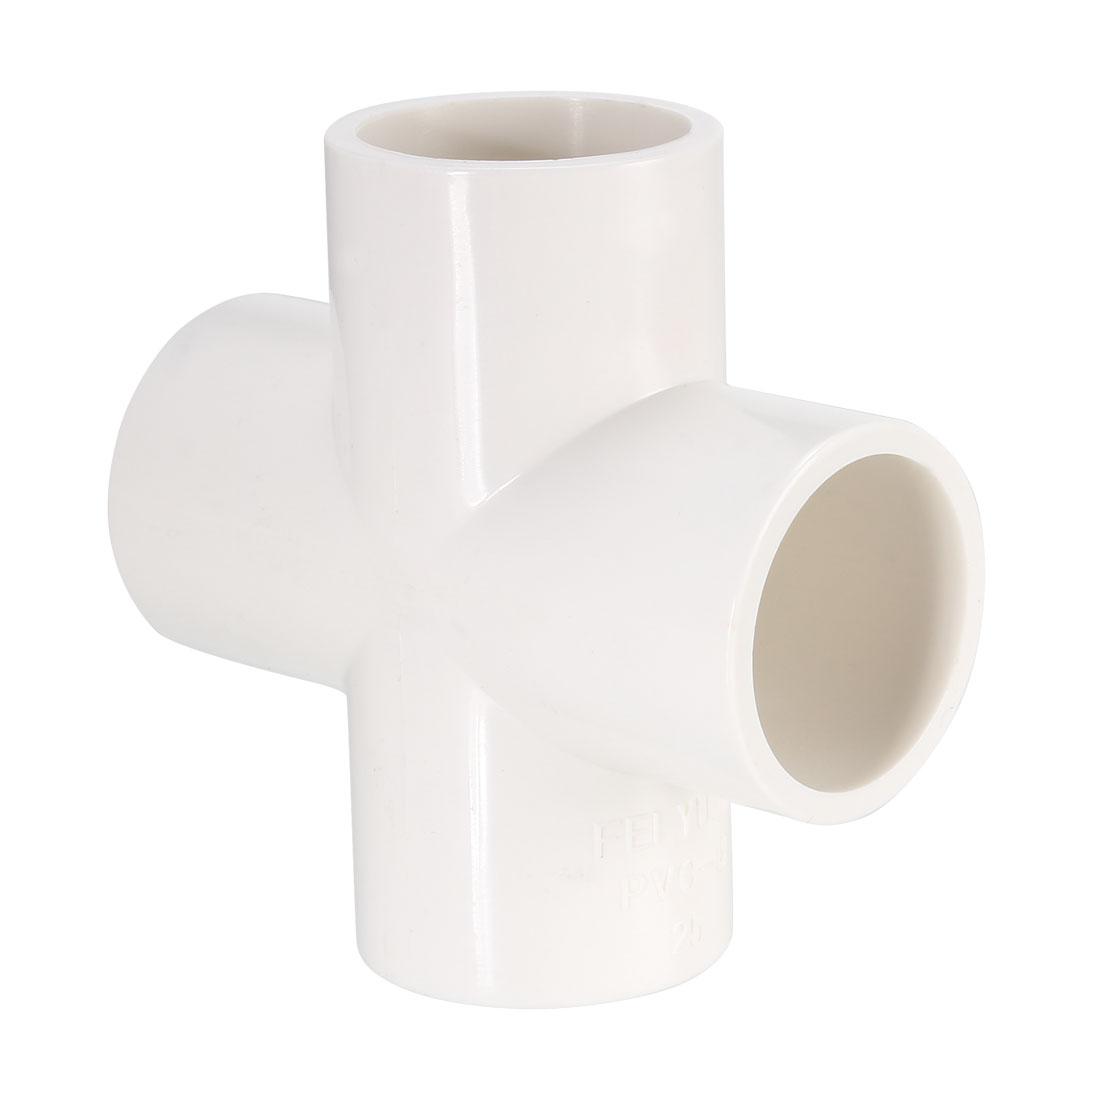 PVC Pipe Fitting, 4 Way Cross, 25mm Socket, PVC Furniture Fittings White 6Pcs